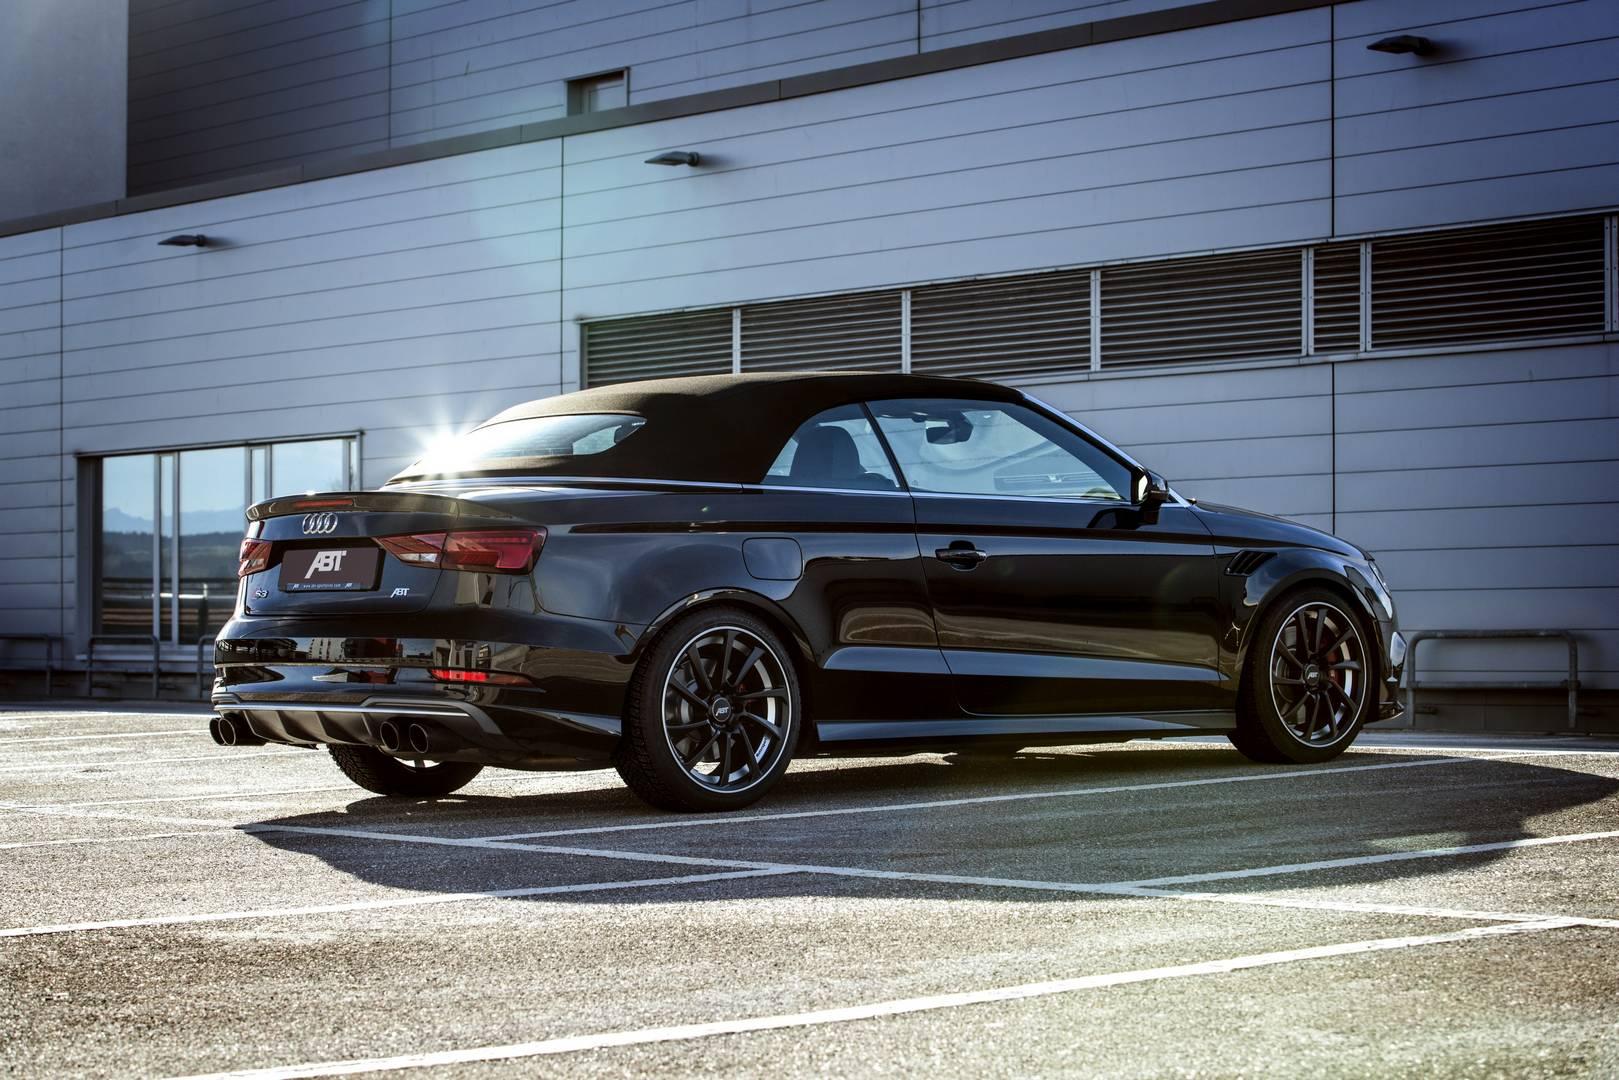 ABT Audi S3 Cabriolet